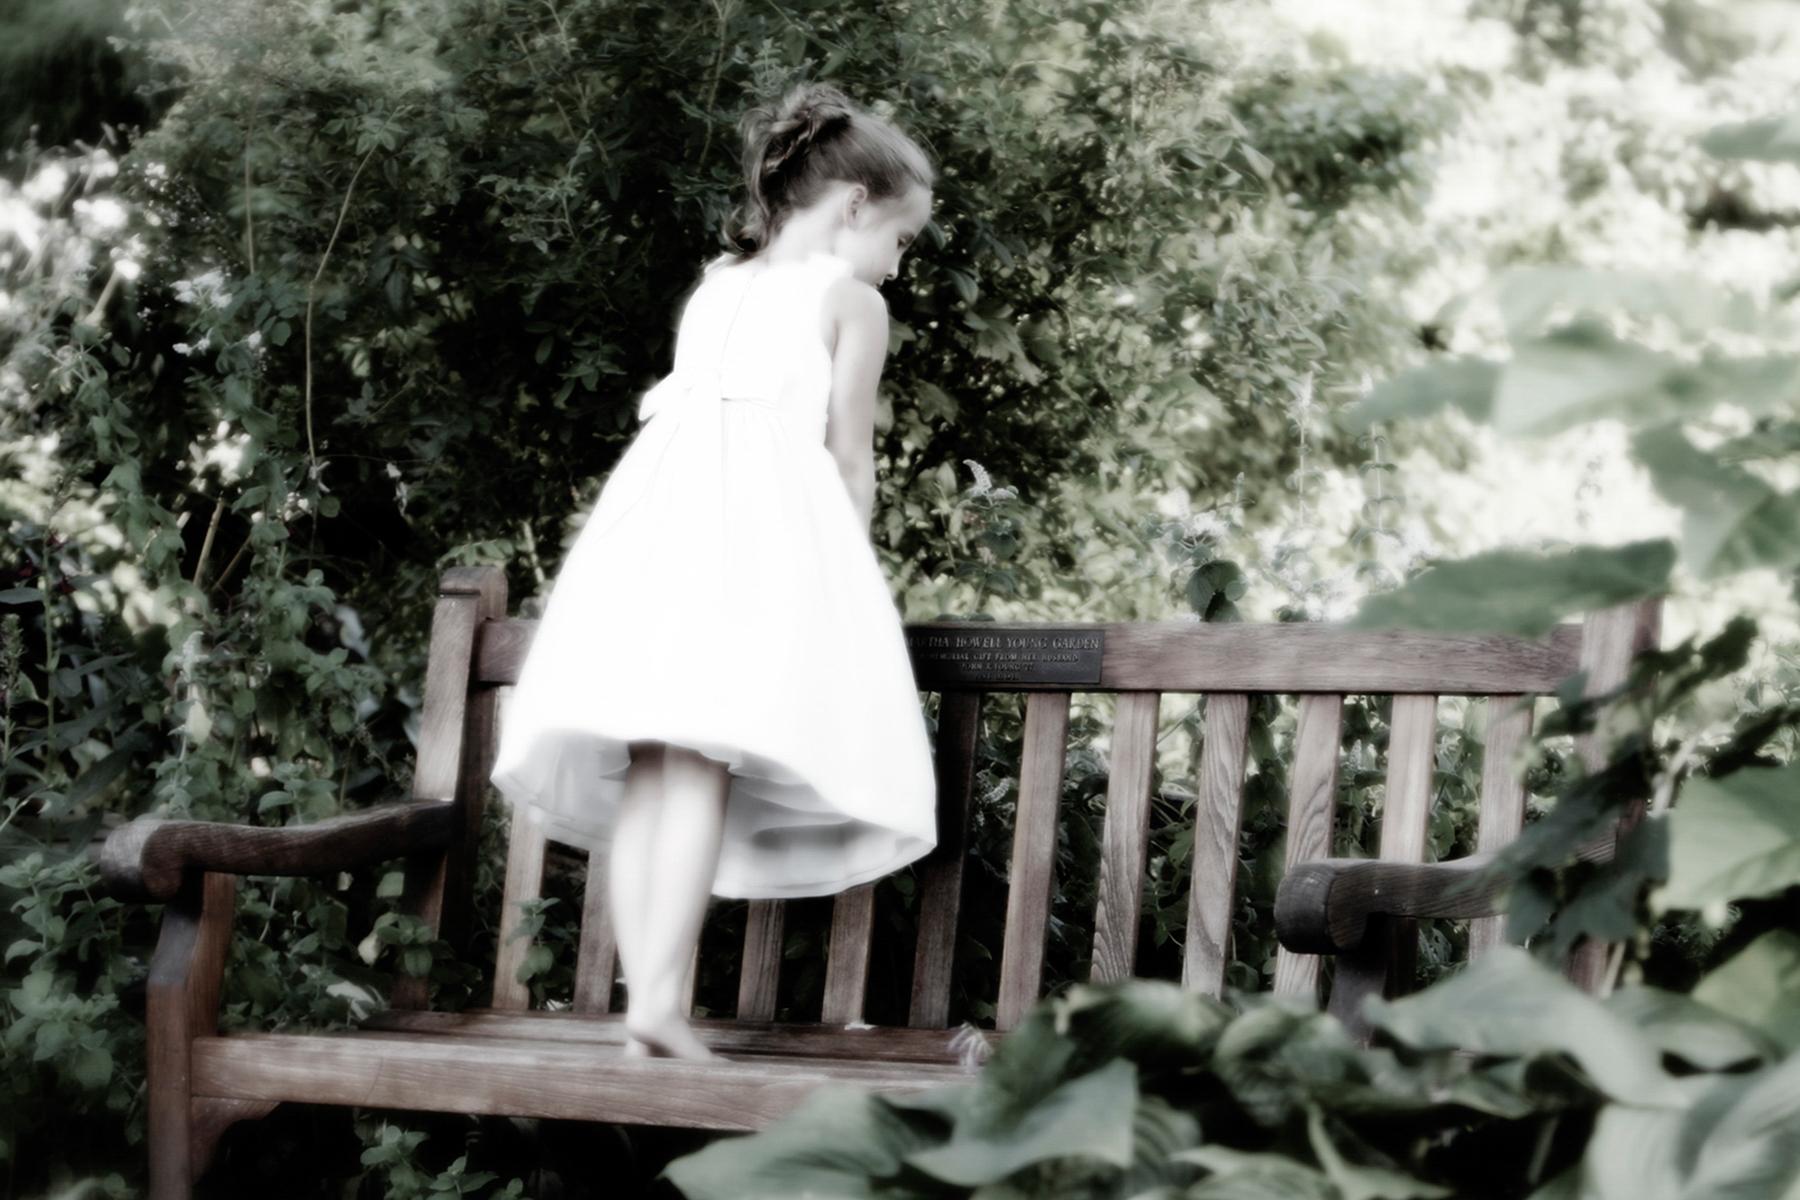 Children_019.jpg